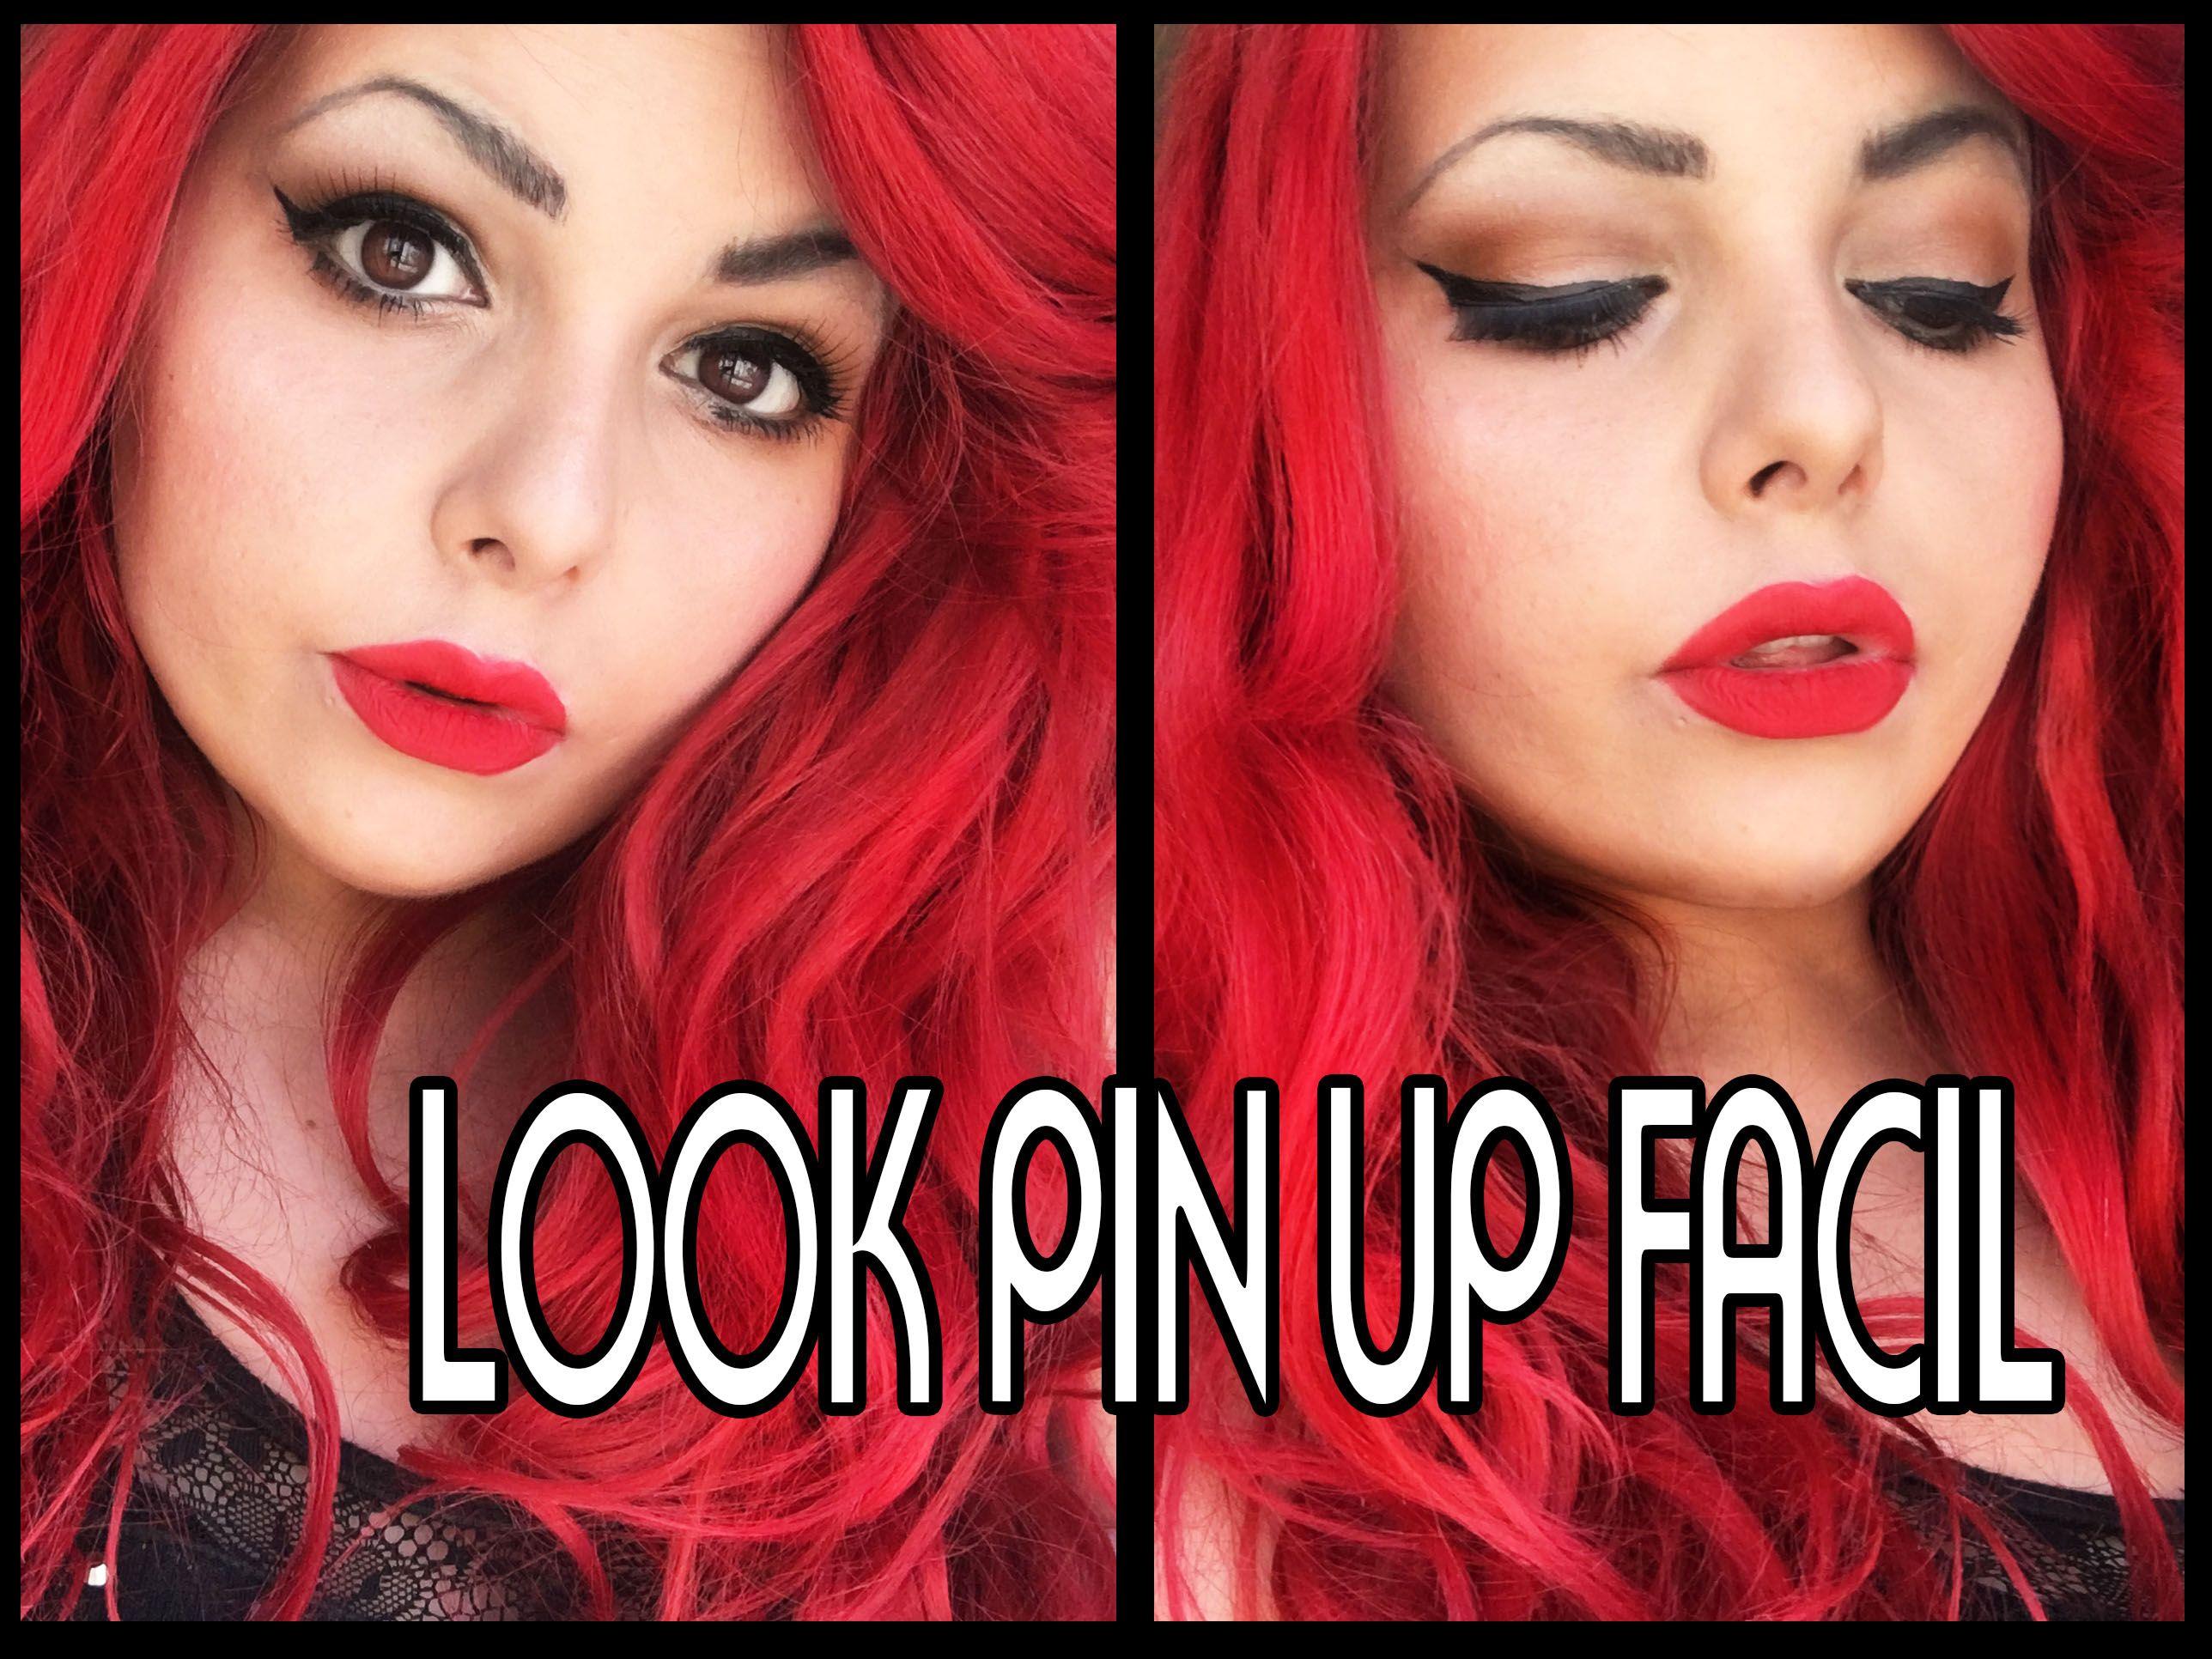 tutorial de maquillaje pin up facil y economico en https://www.youtube.com/watch?v=7btvL_6S-kU